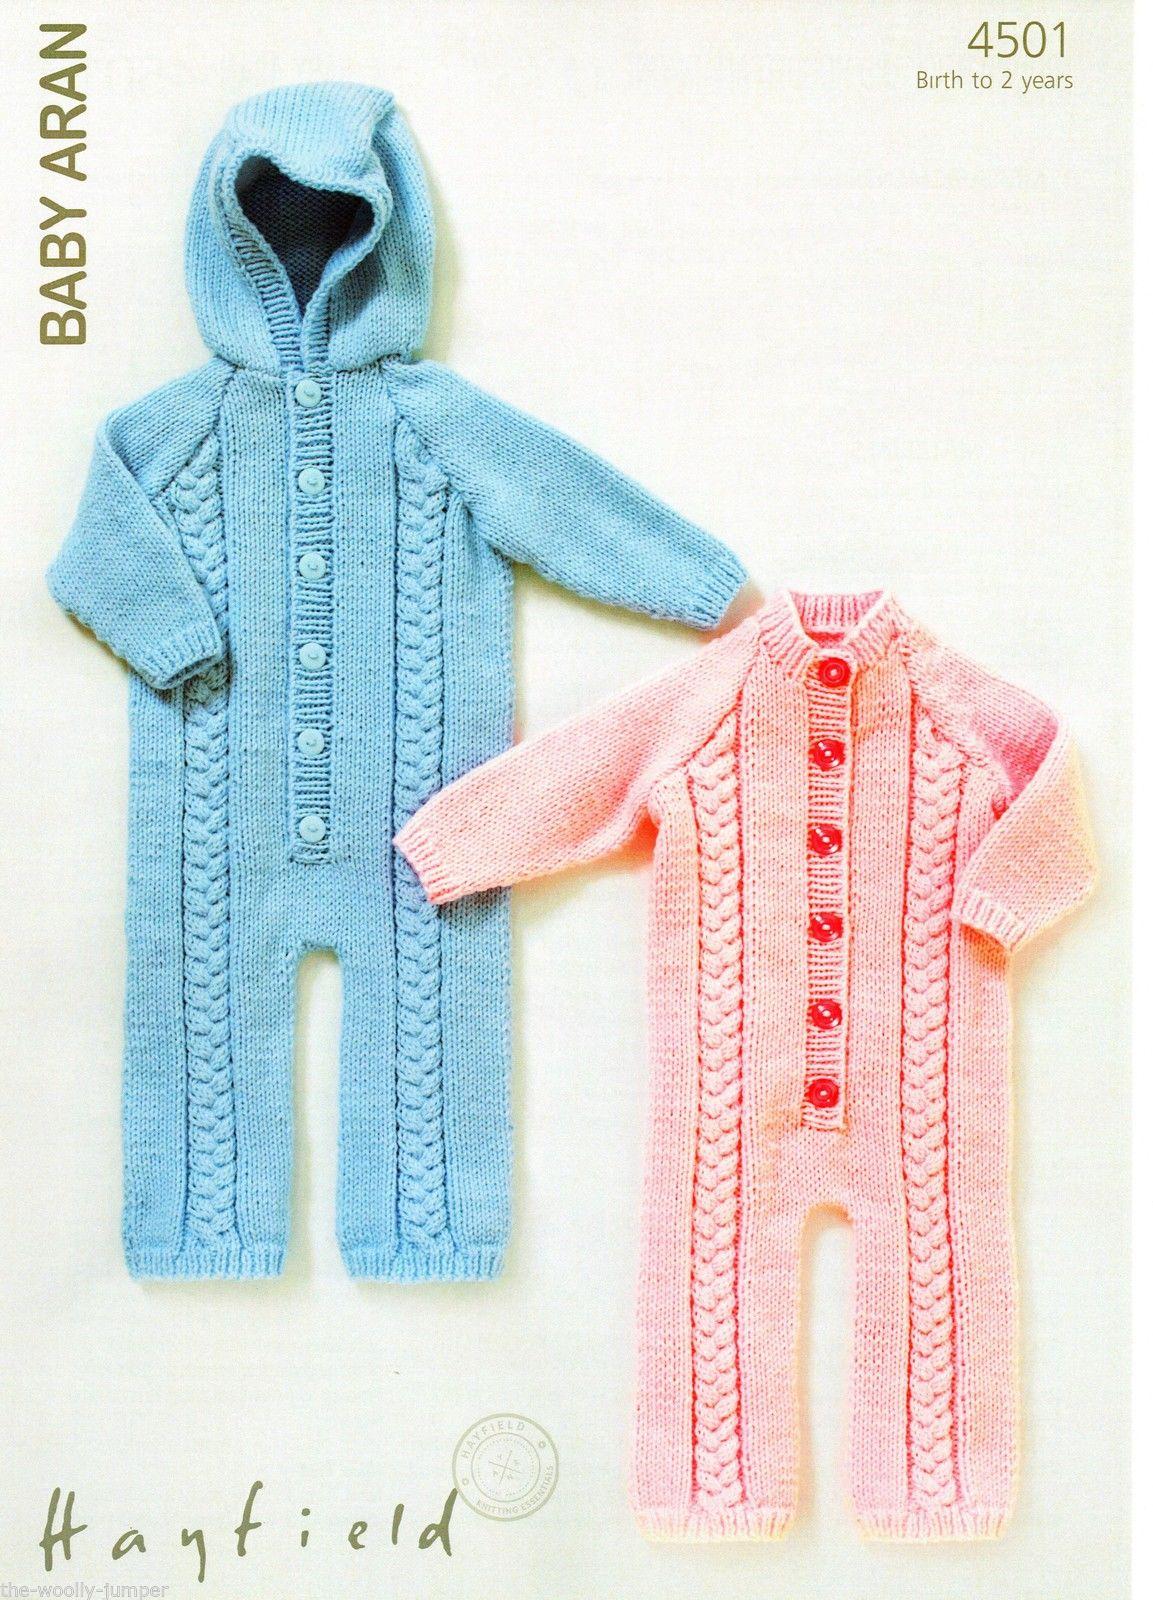 Knitting Pattern Balaclava 4500 Hayfield Ba Aran Hat Balaclava Beret Helmet Knitting Pattern To Fit 0 To 7 Years